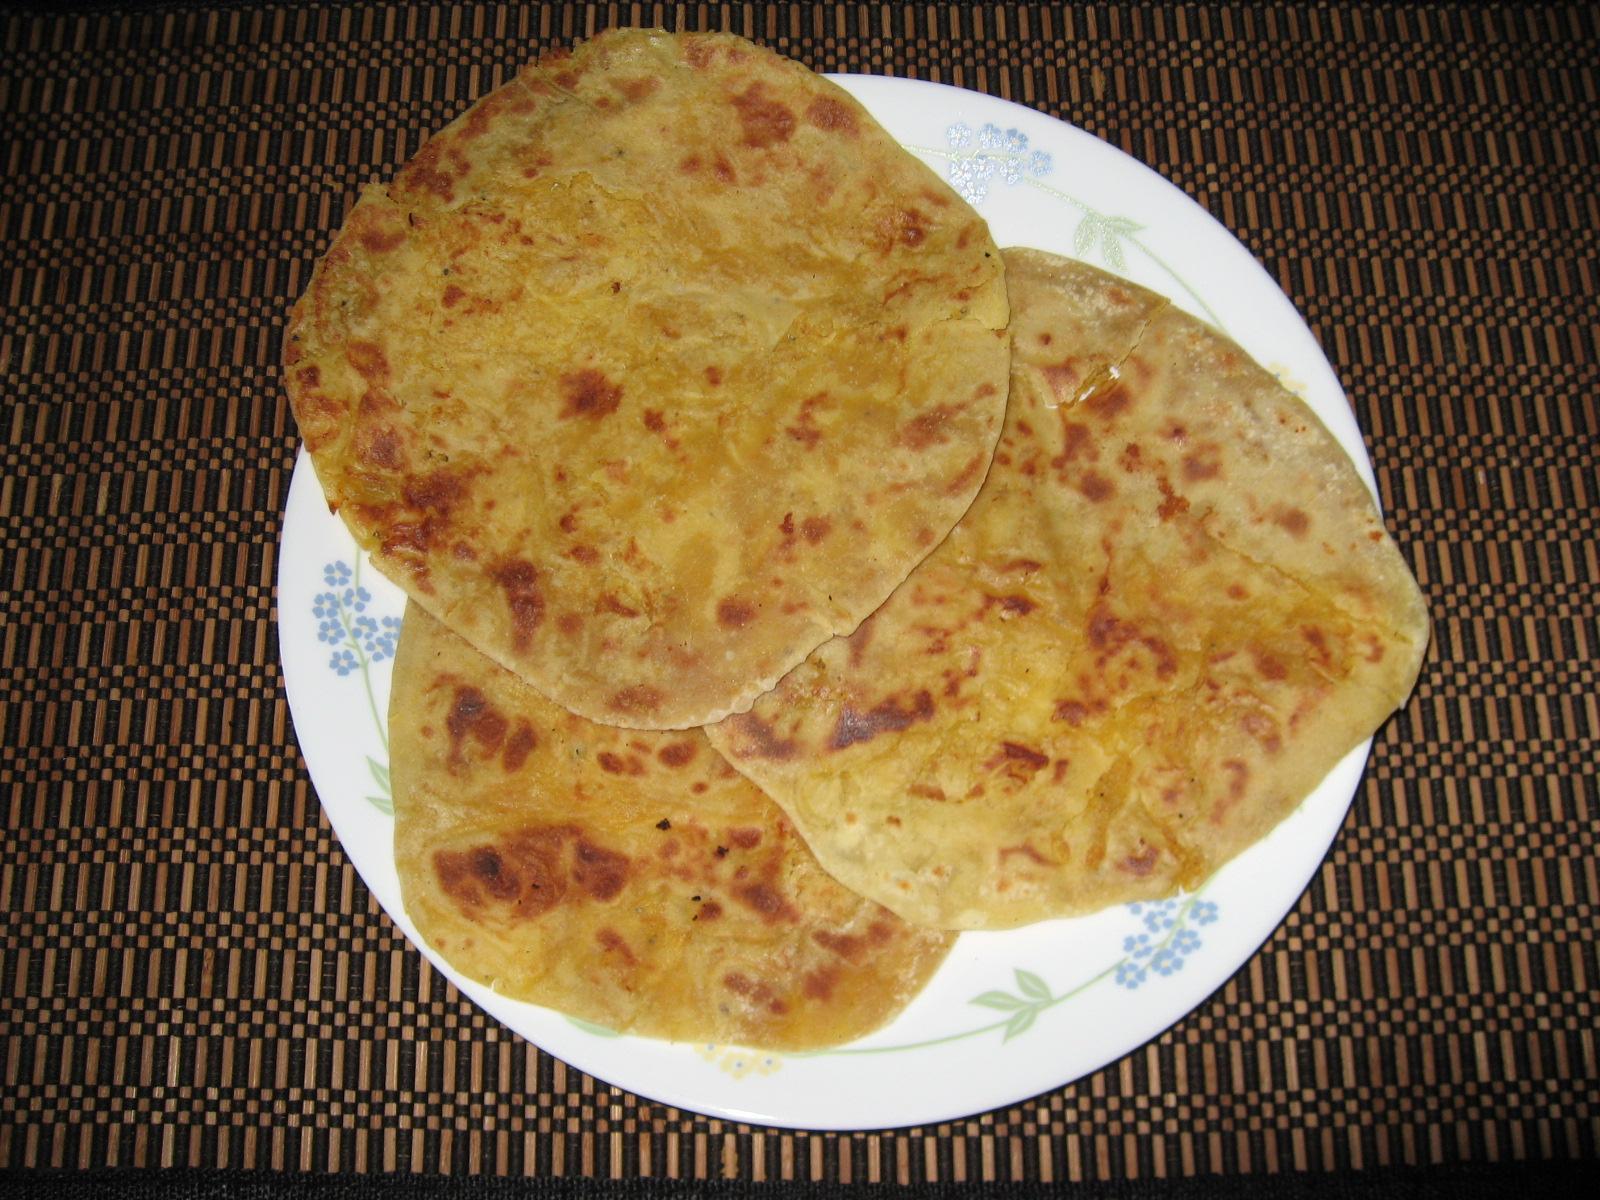 Cake Icing Recipes In Marathi: Puran Poli Recipe, Jaggery/Panela Stuffed In All-Purpose